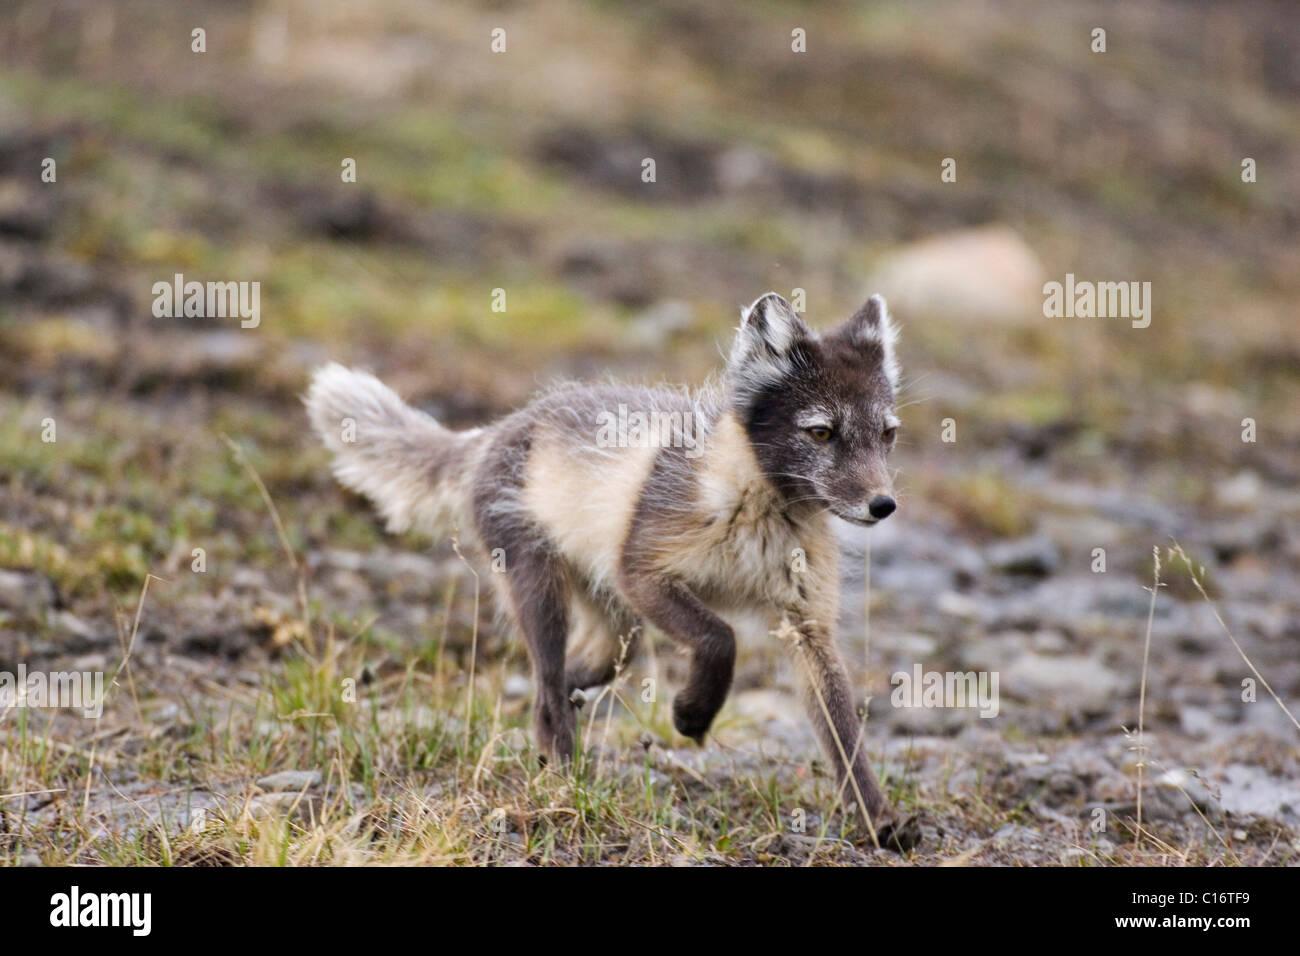 Arctic Fox, White Fox or Snow Fox (Alopex lagopus) running in its summer coat, Spitsbergen, Norway Stock Photo